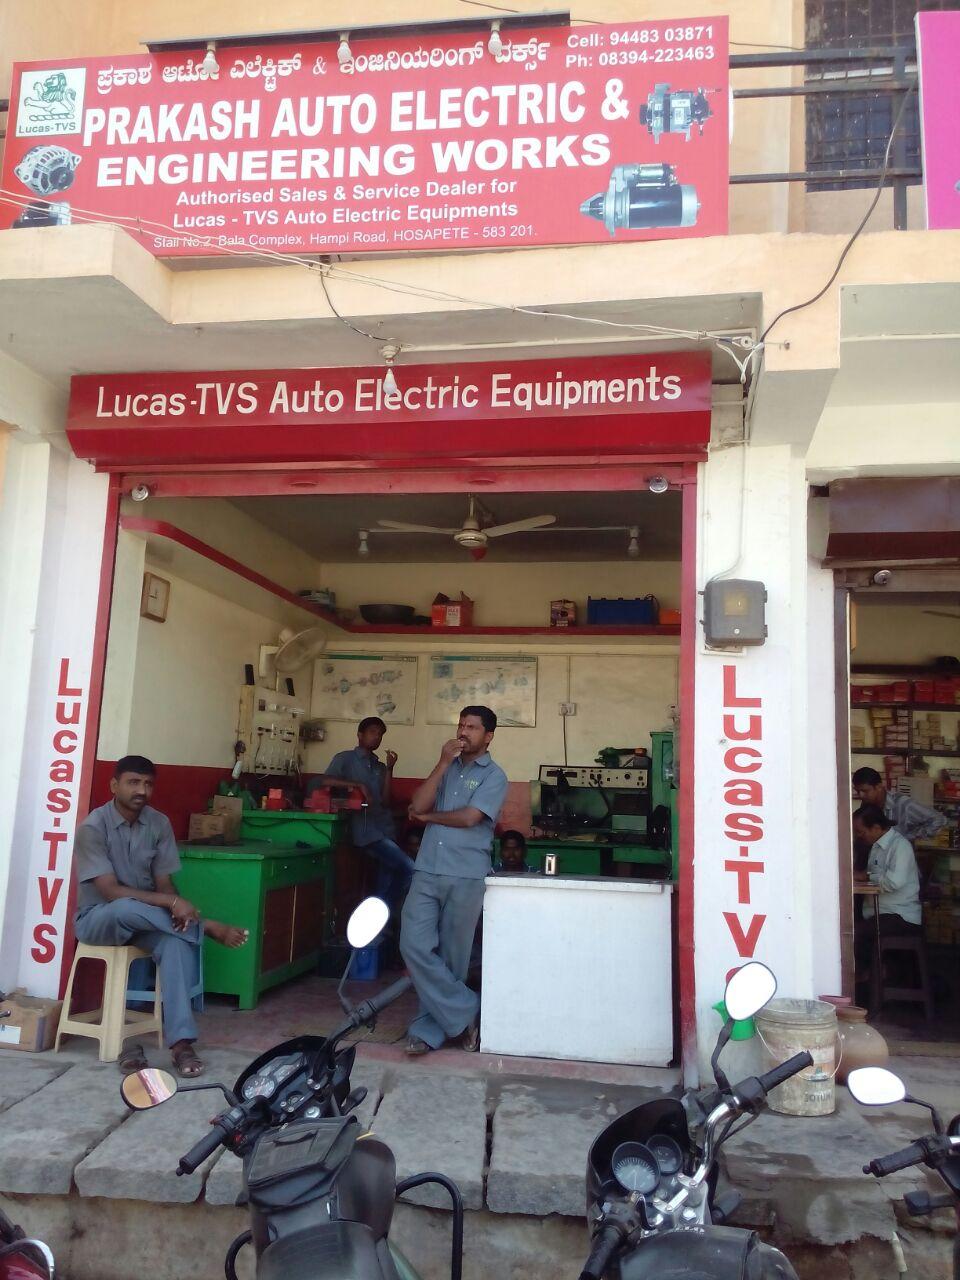 PRAKASH AUTO ELECTRIC & ENGINEERING WORKS